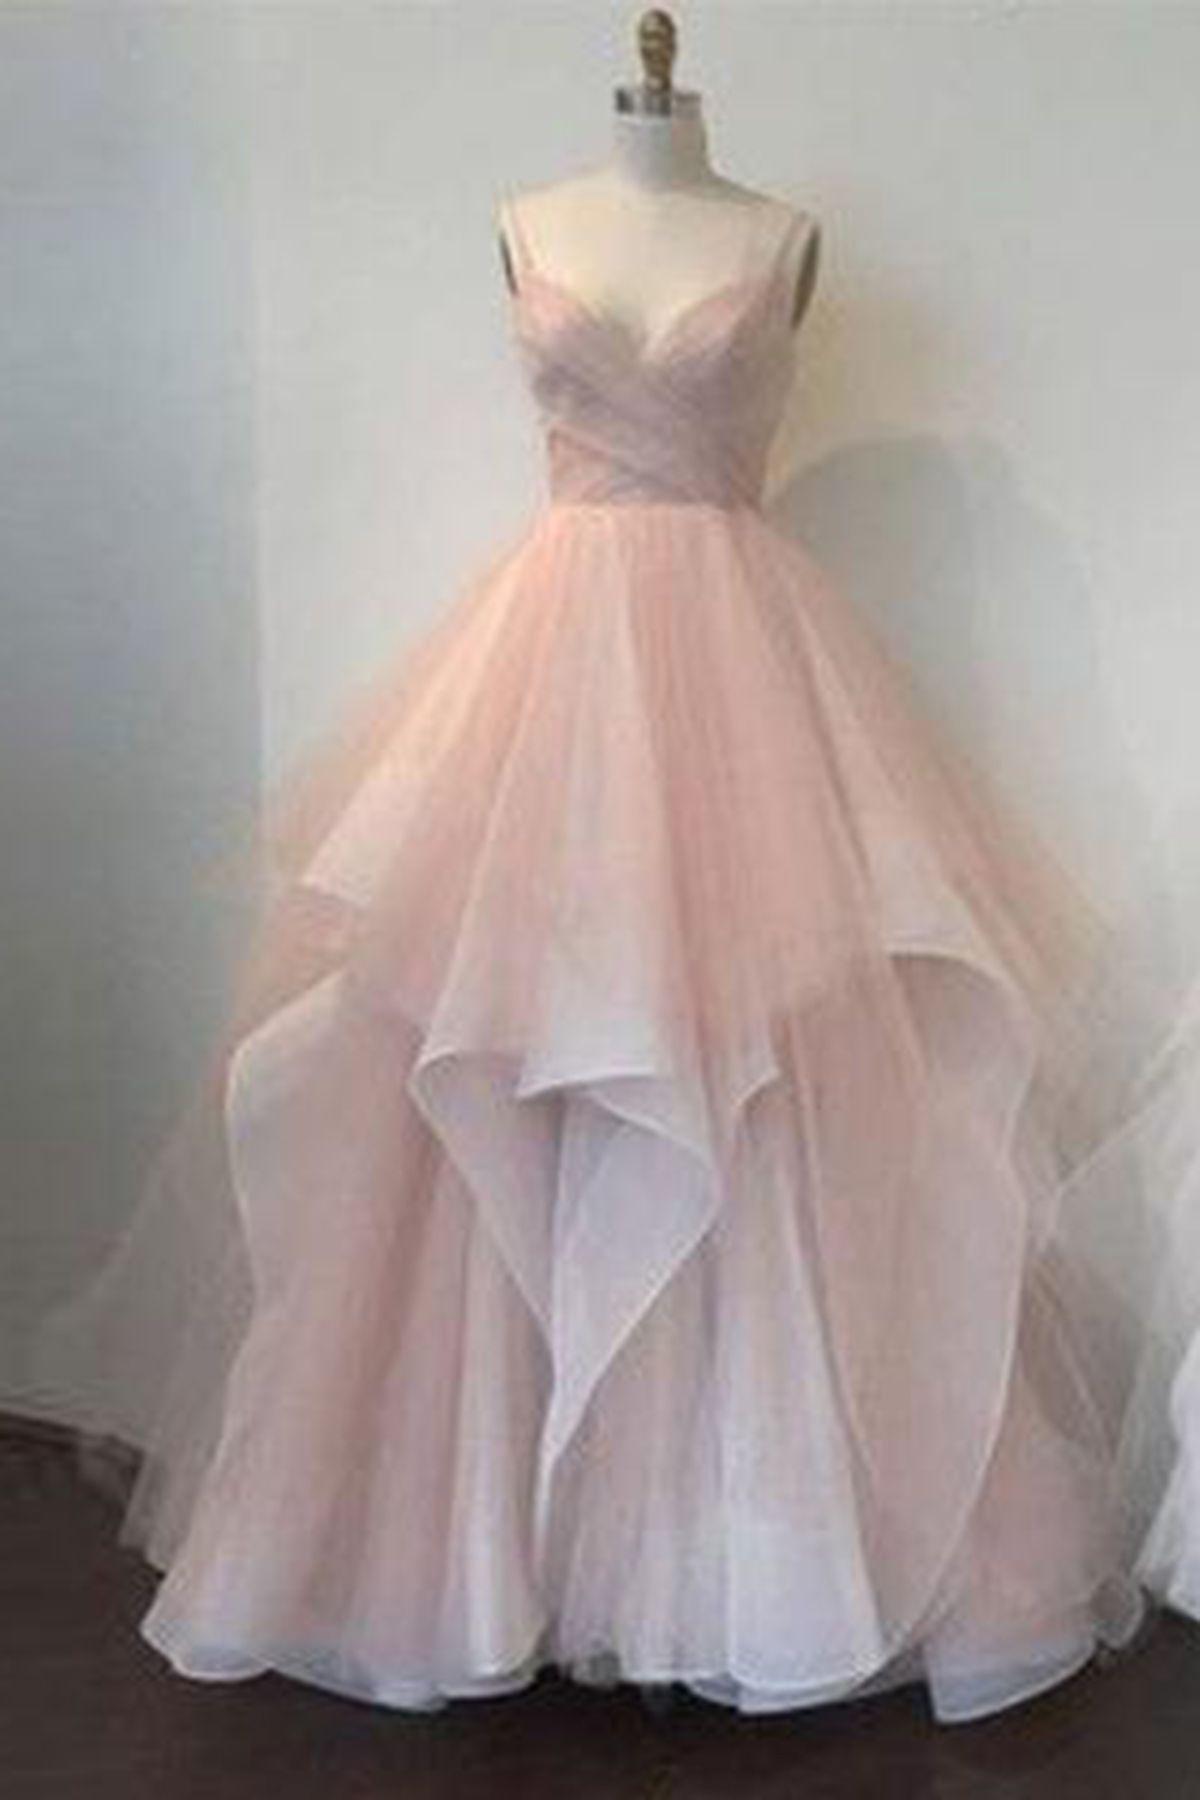 Blush Pink Tulle Sweetheart Neckline Long Senior Prom Dresses Pink Evening Dress Senior Prom Dresses Sweetheart Dress [ 1800 x 1200 Pixel ]